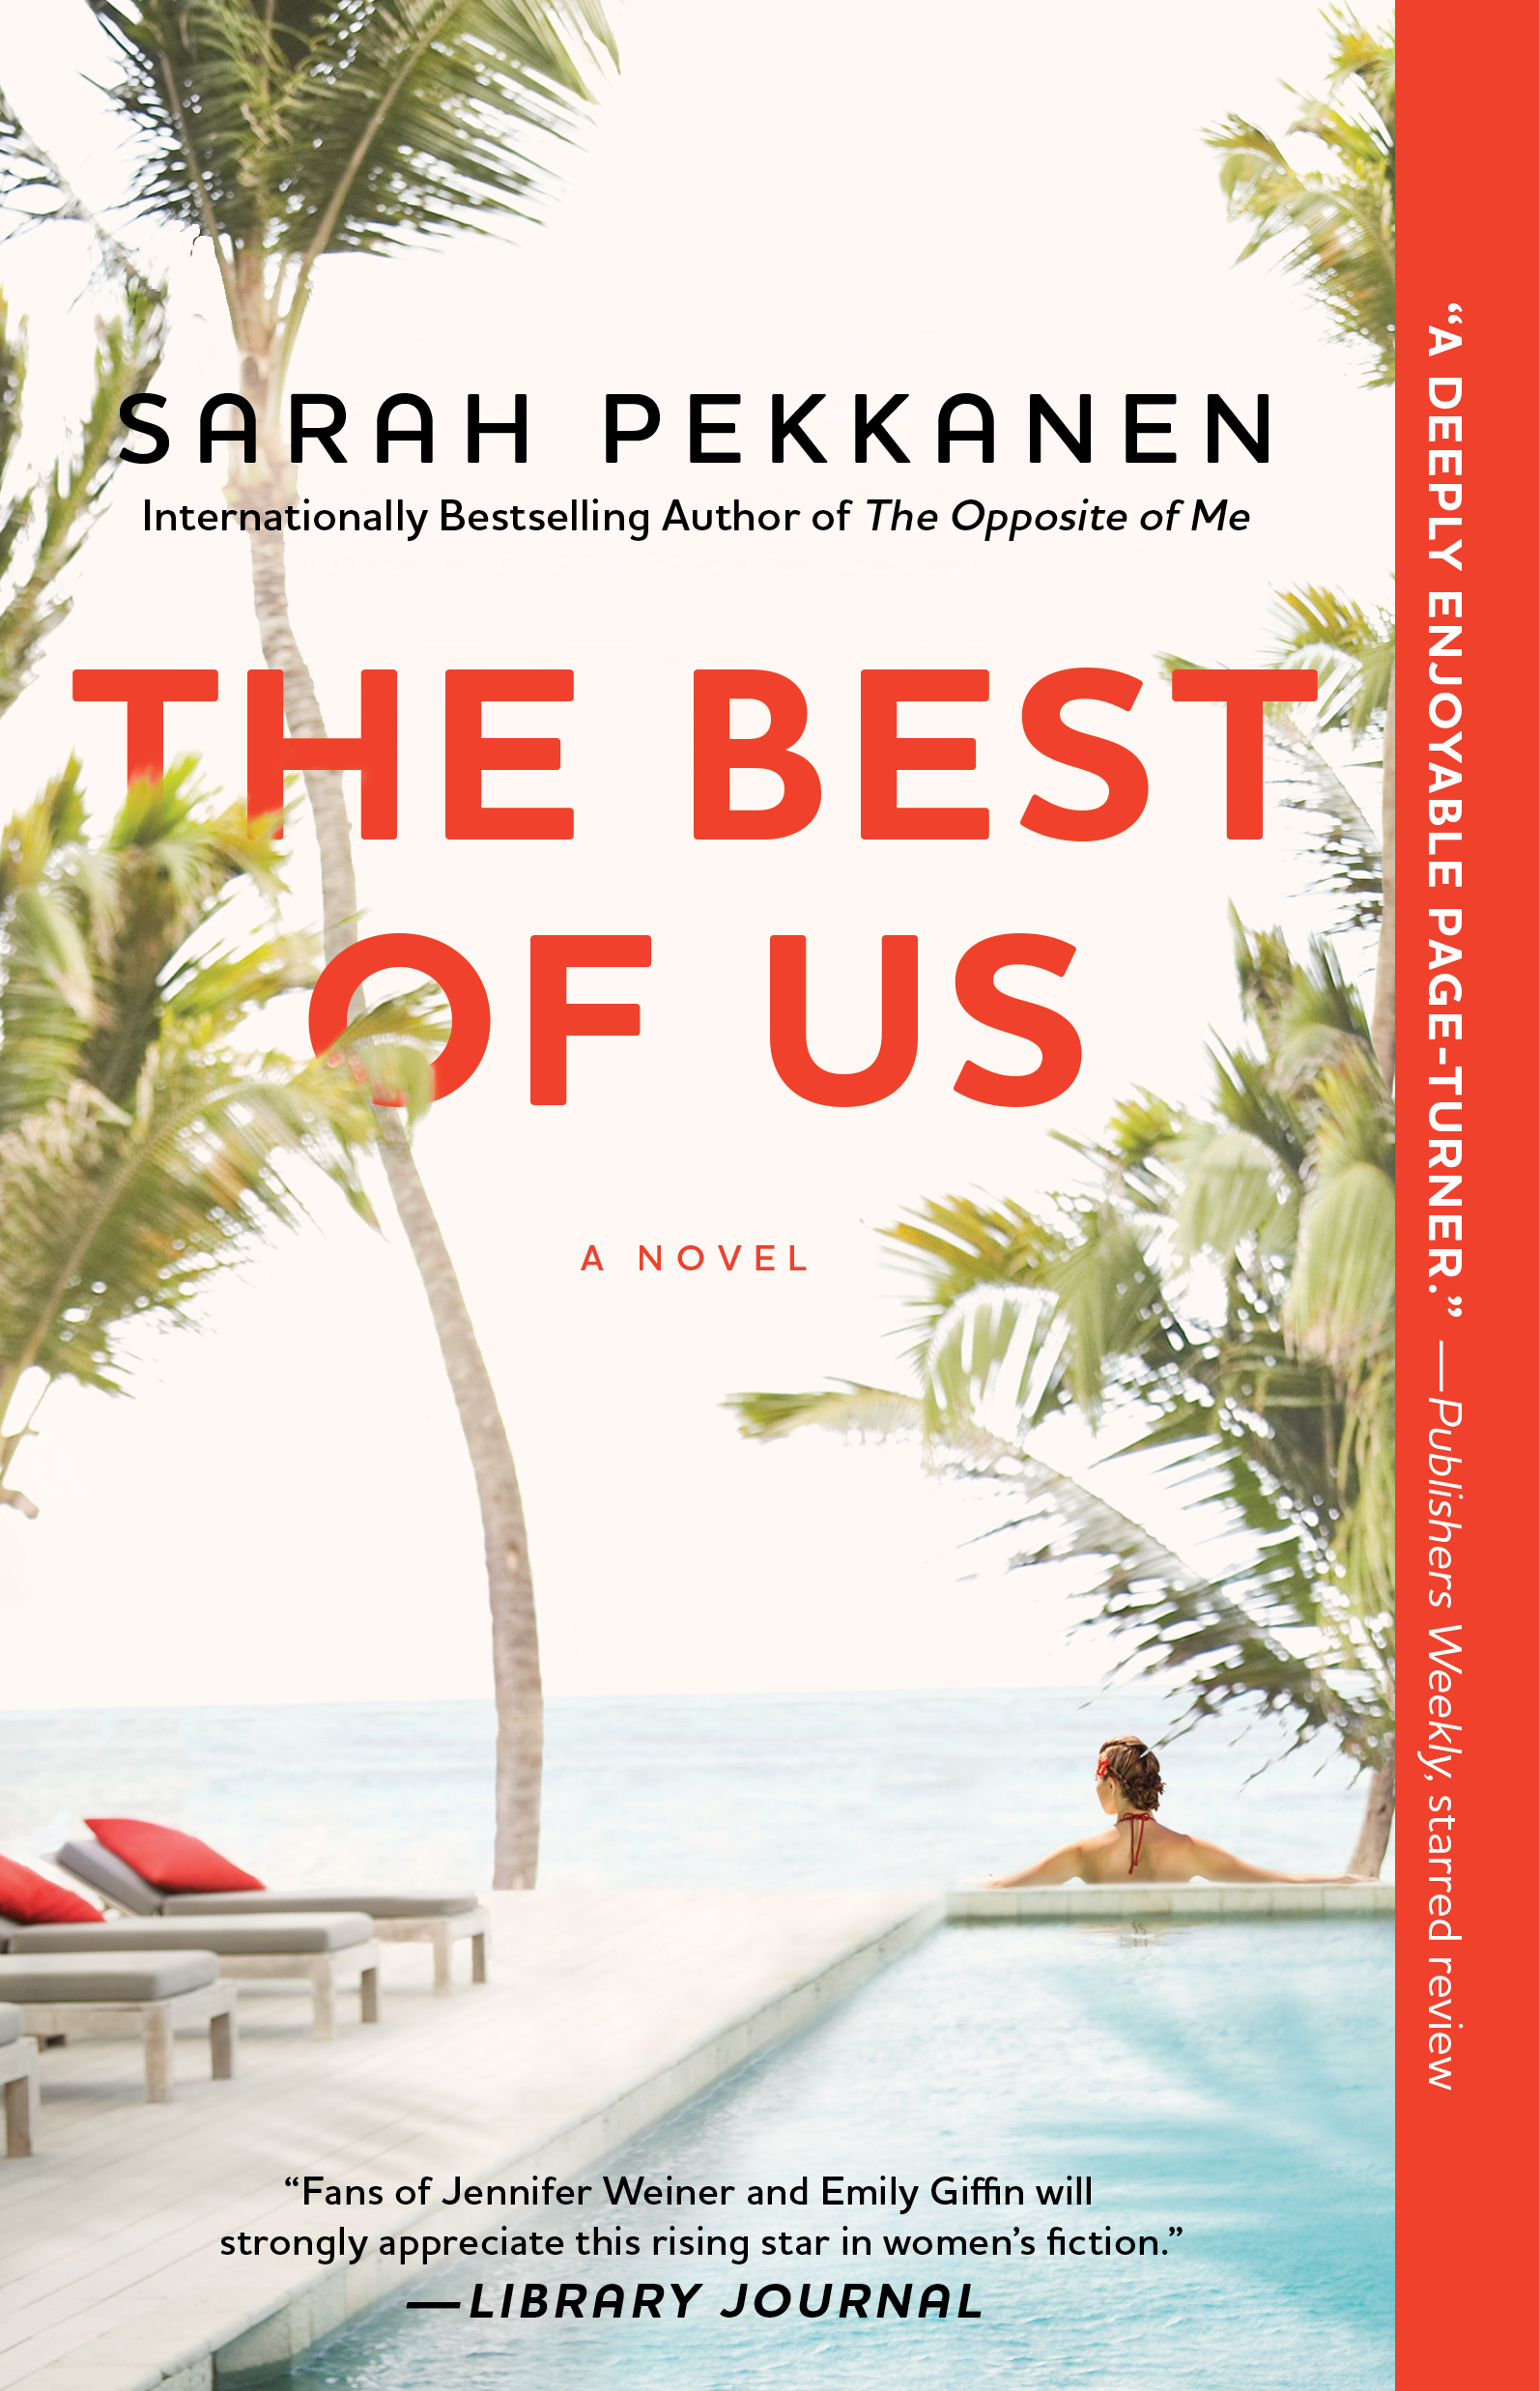 The Best of Us by Sarah Pekkanen